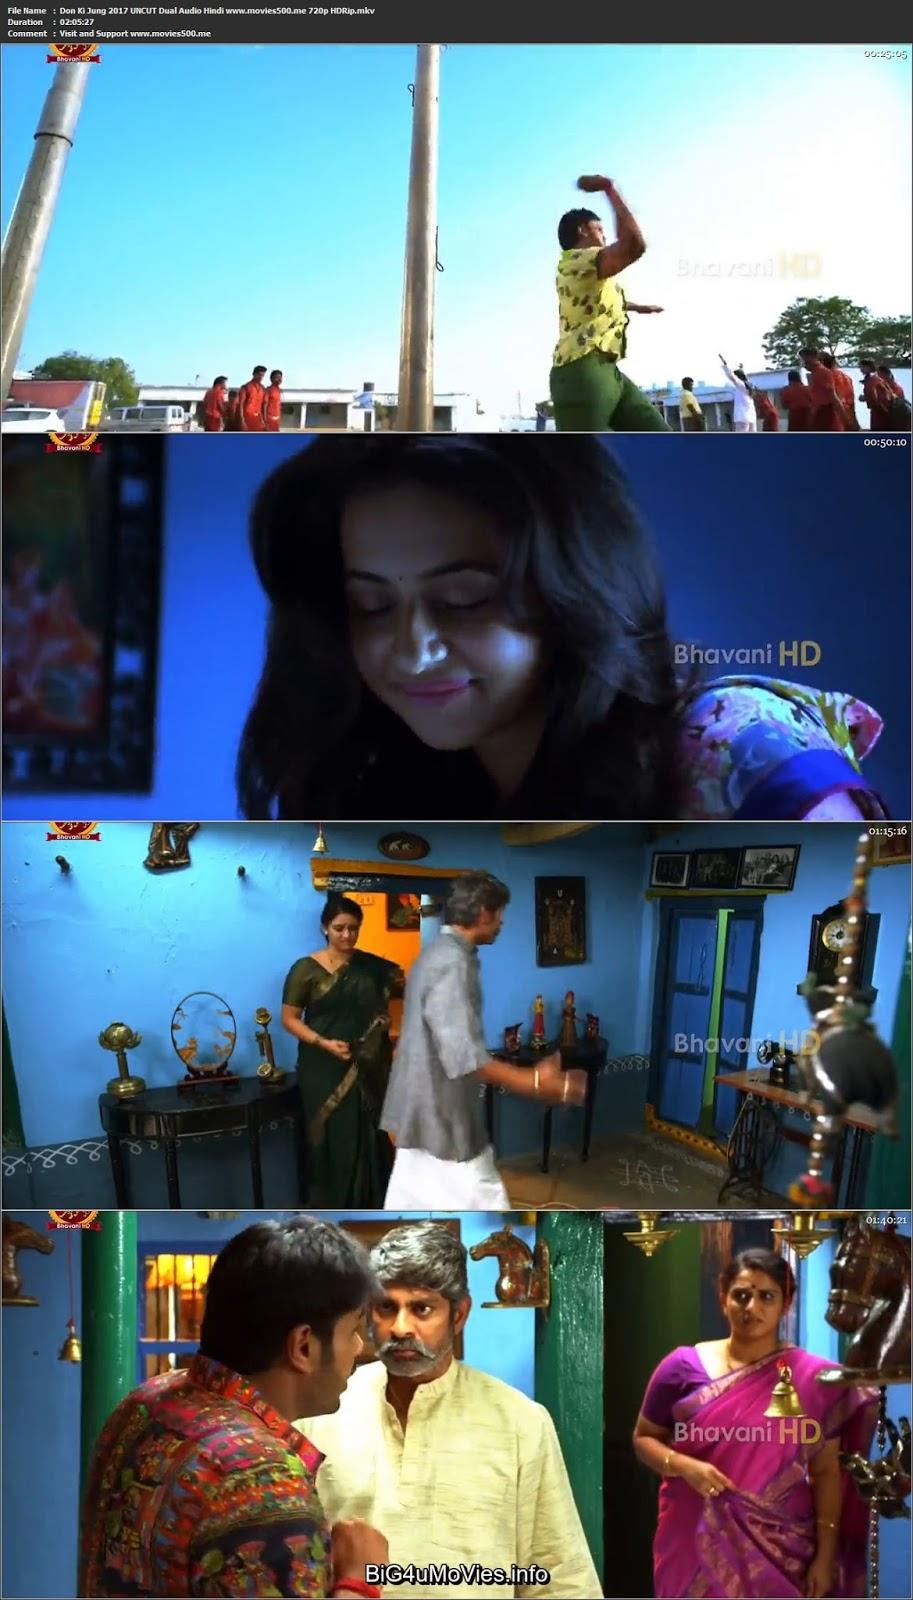 Don Ki Jung 2017 Dual Audio UnCUT Hindi Telugu HDRip 720p at movies500.xyz